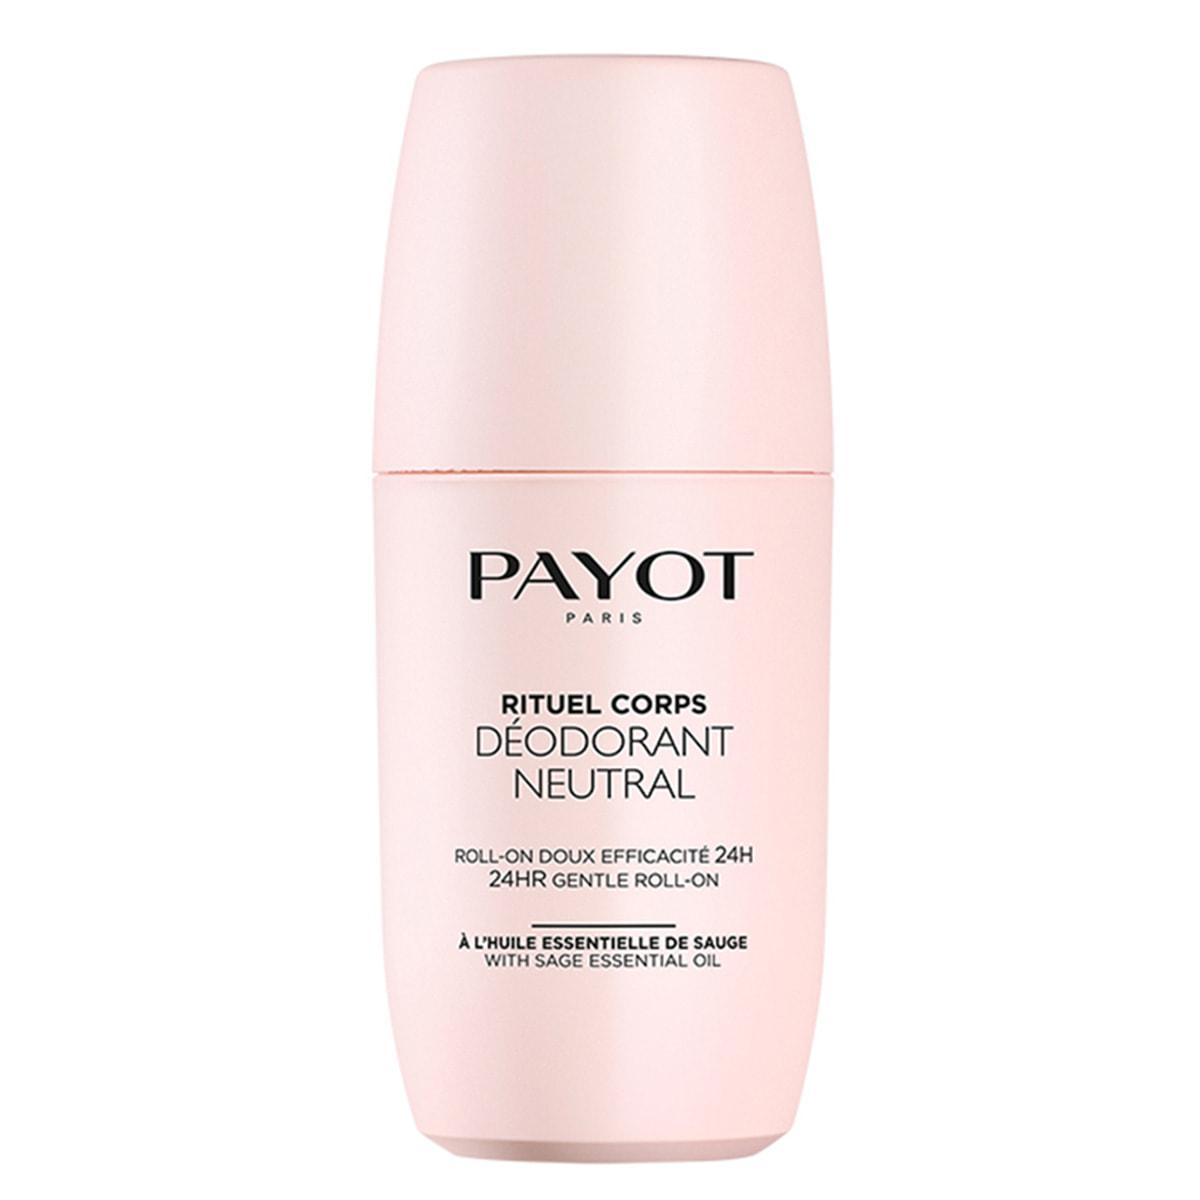 Payot - Déodorant Neutral - Roll-on doux efficacité 24h